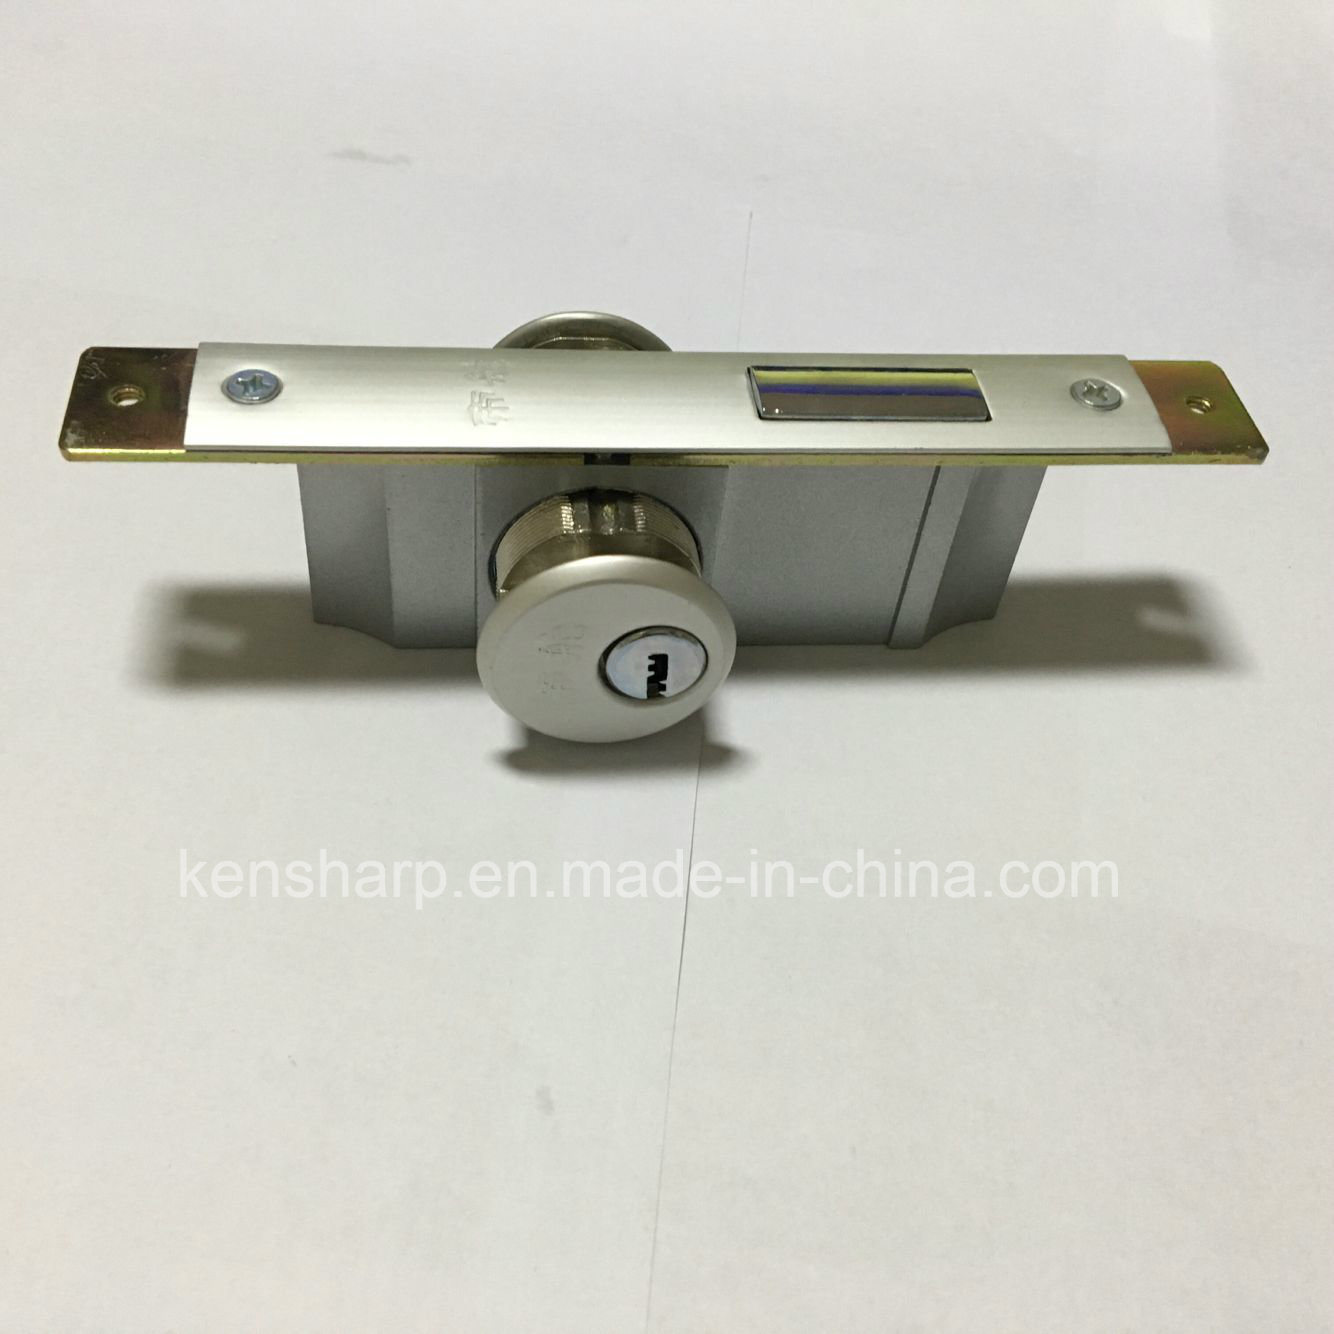 81054-B1 Shop Commercial Glass Door Locks and 60mm Computer Keys Lock